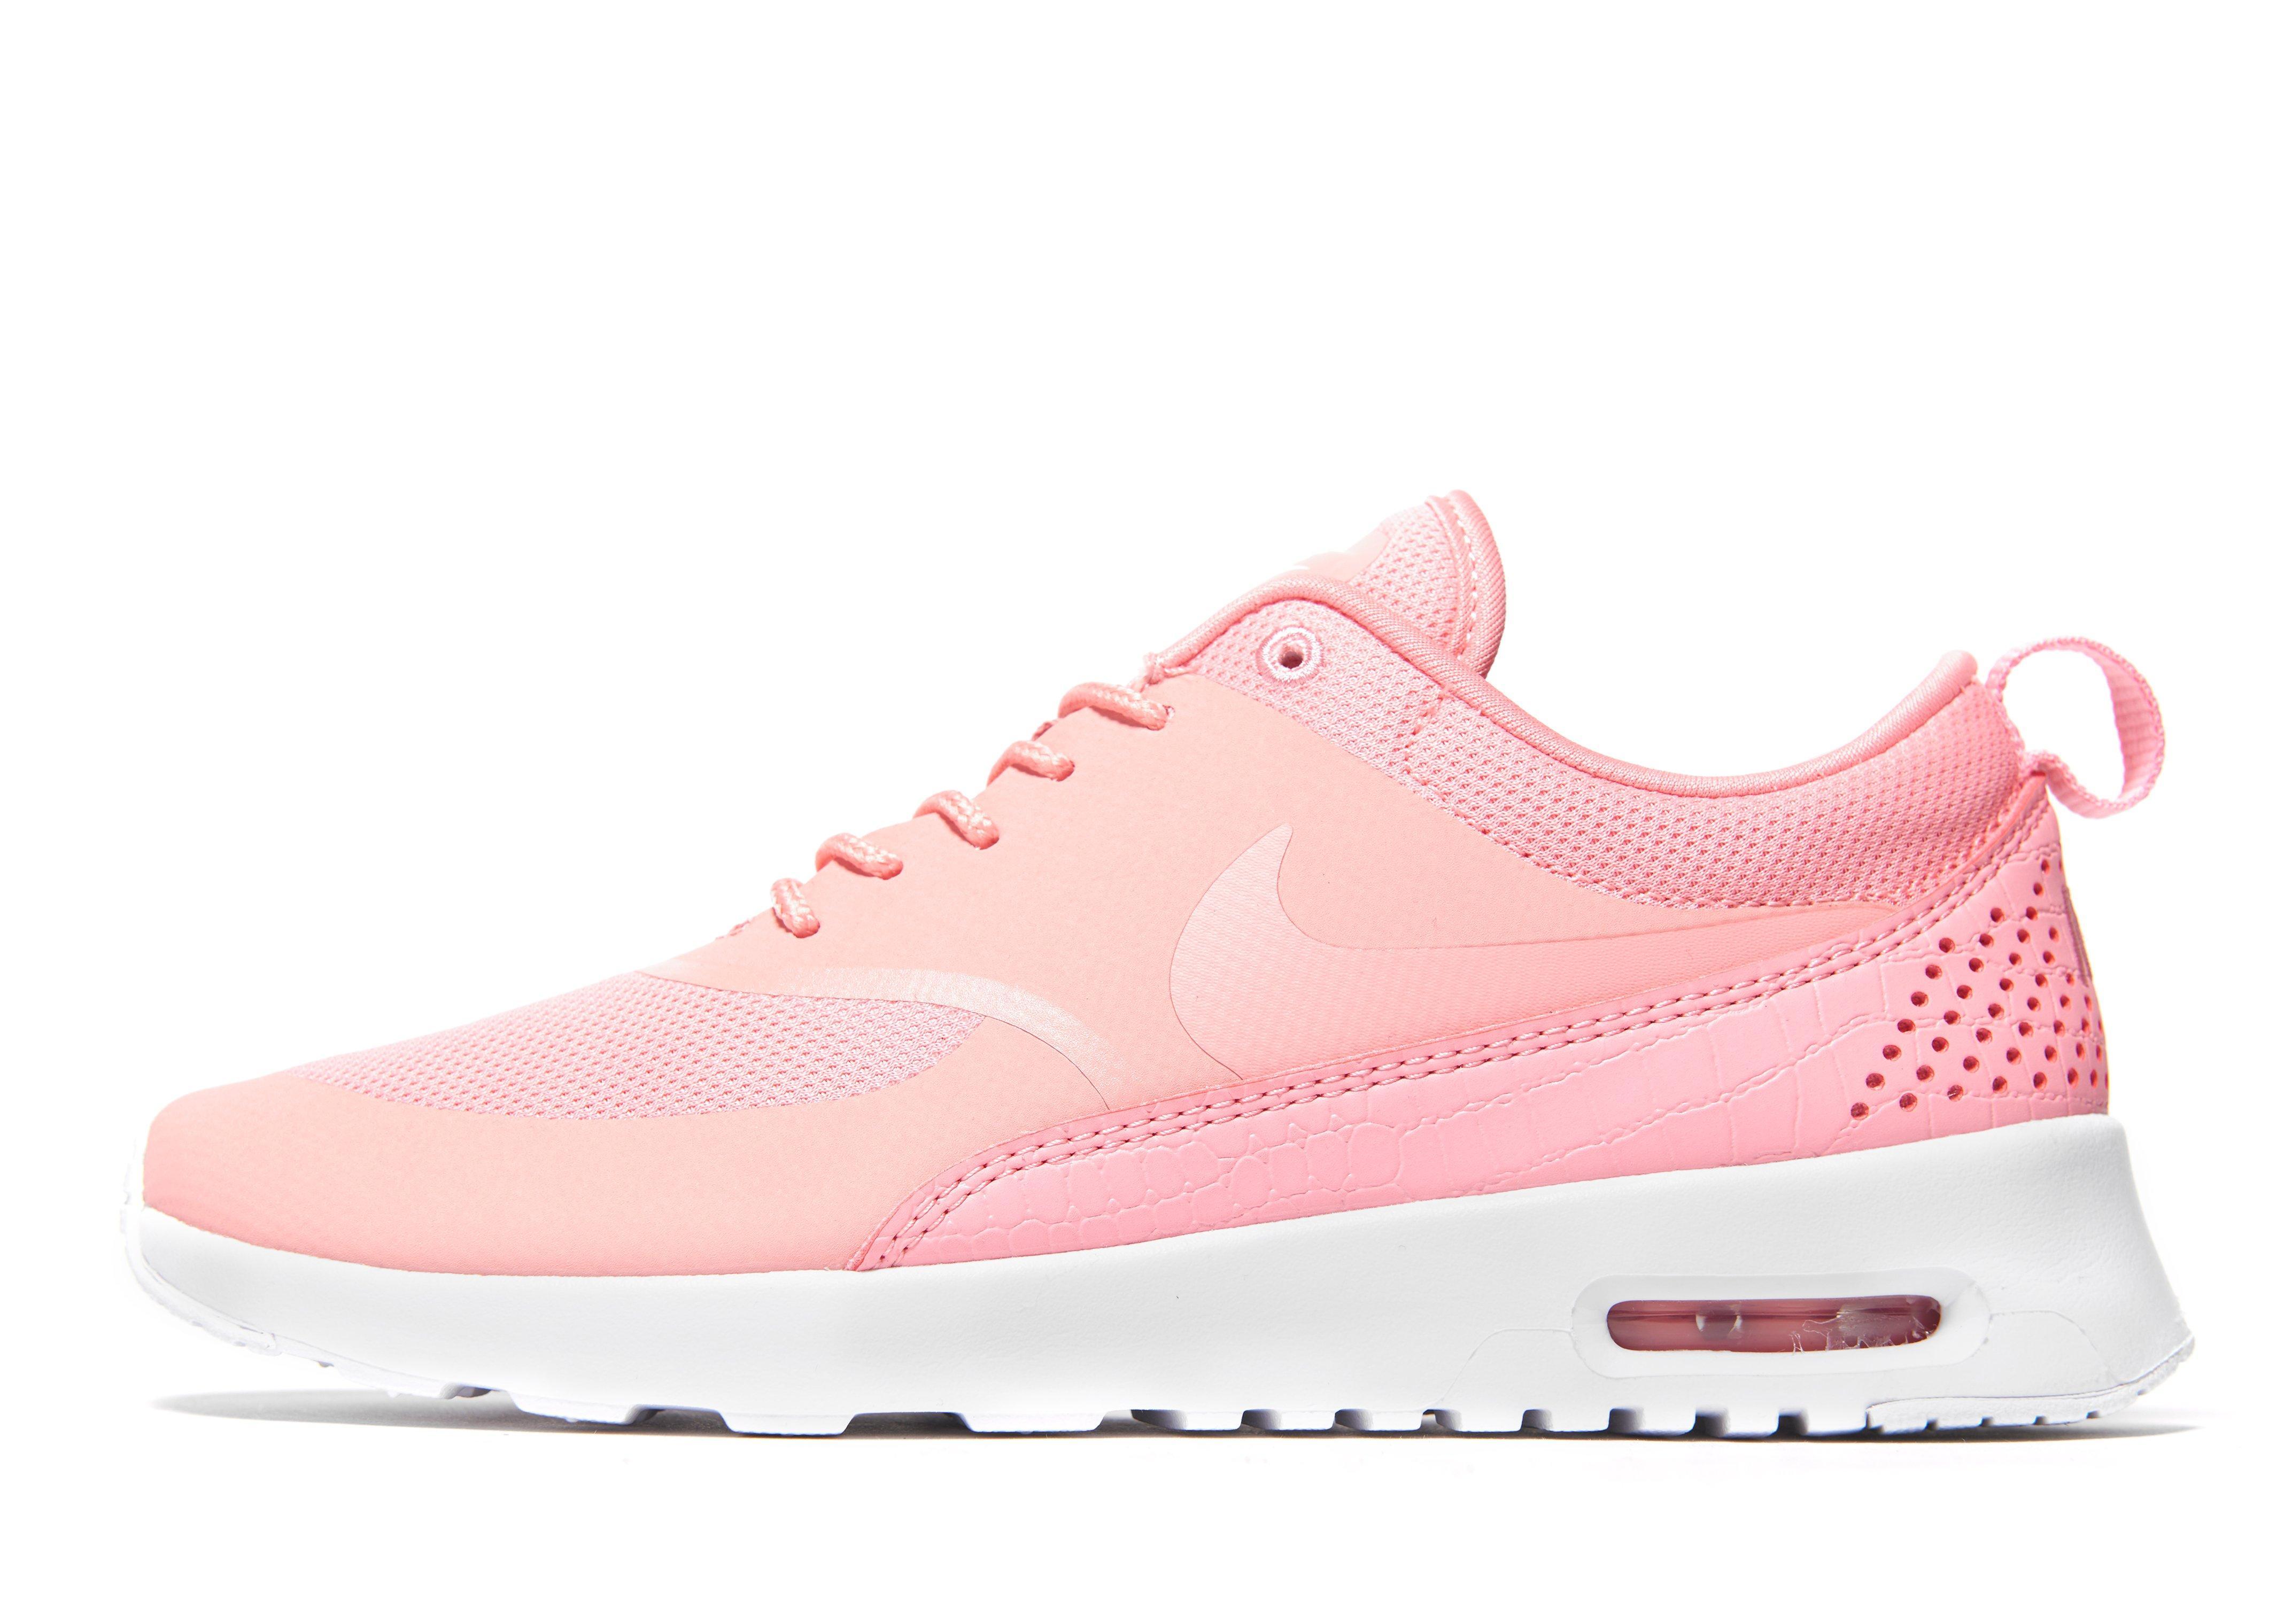 nike air max thea pink